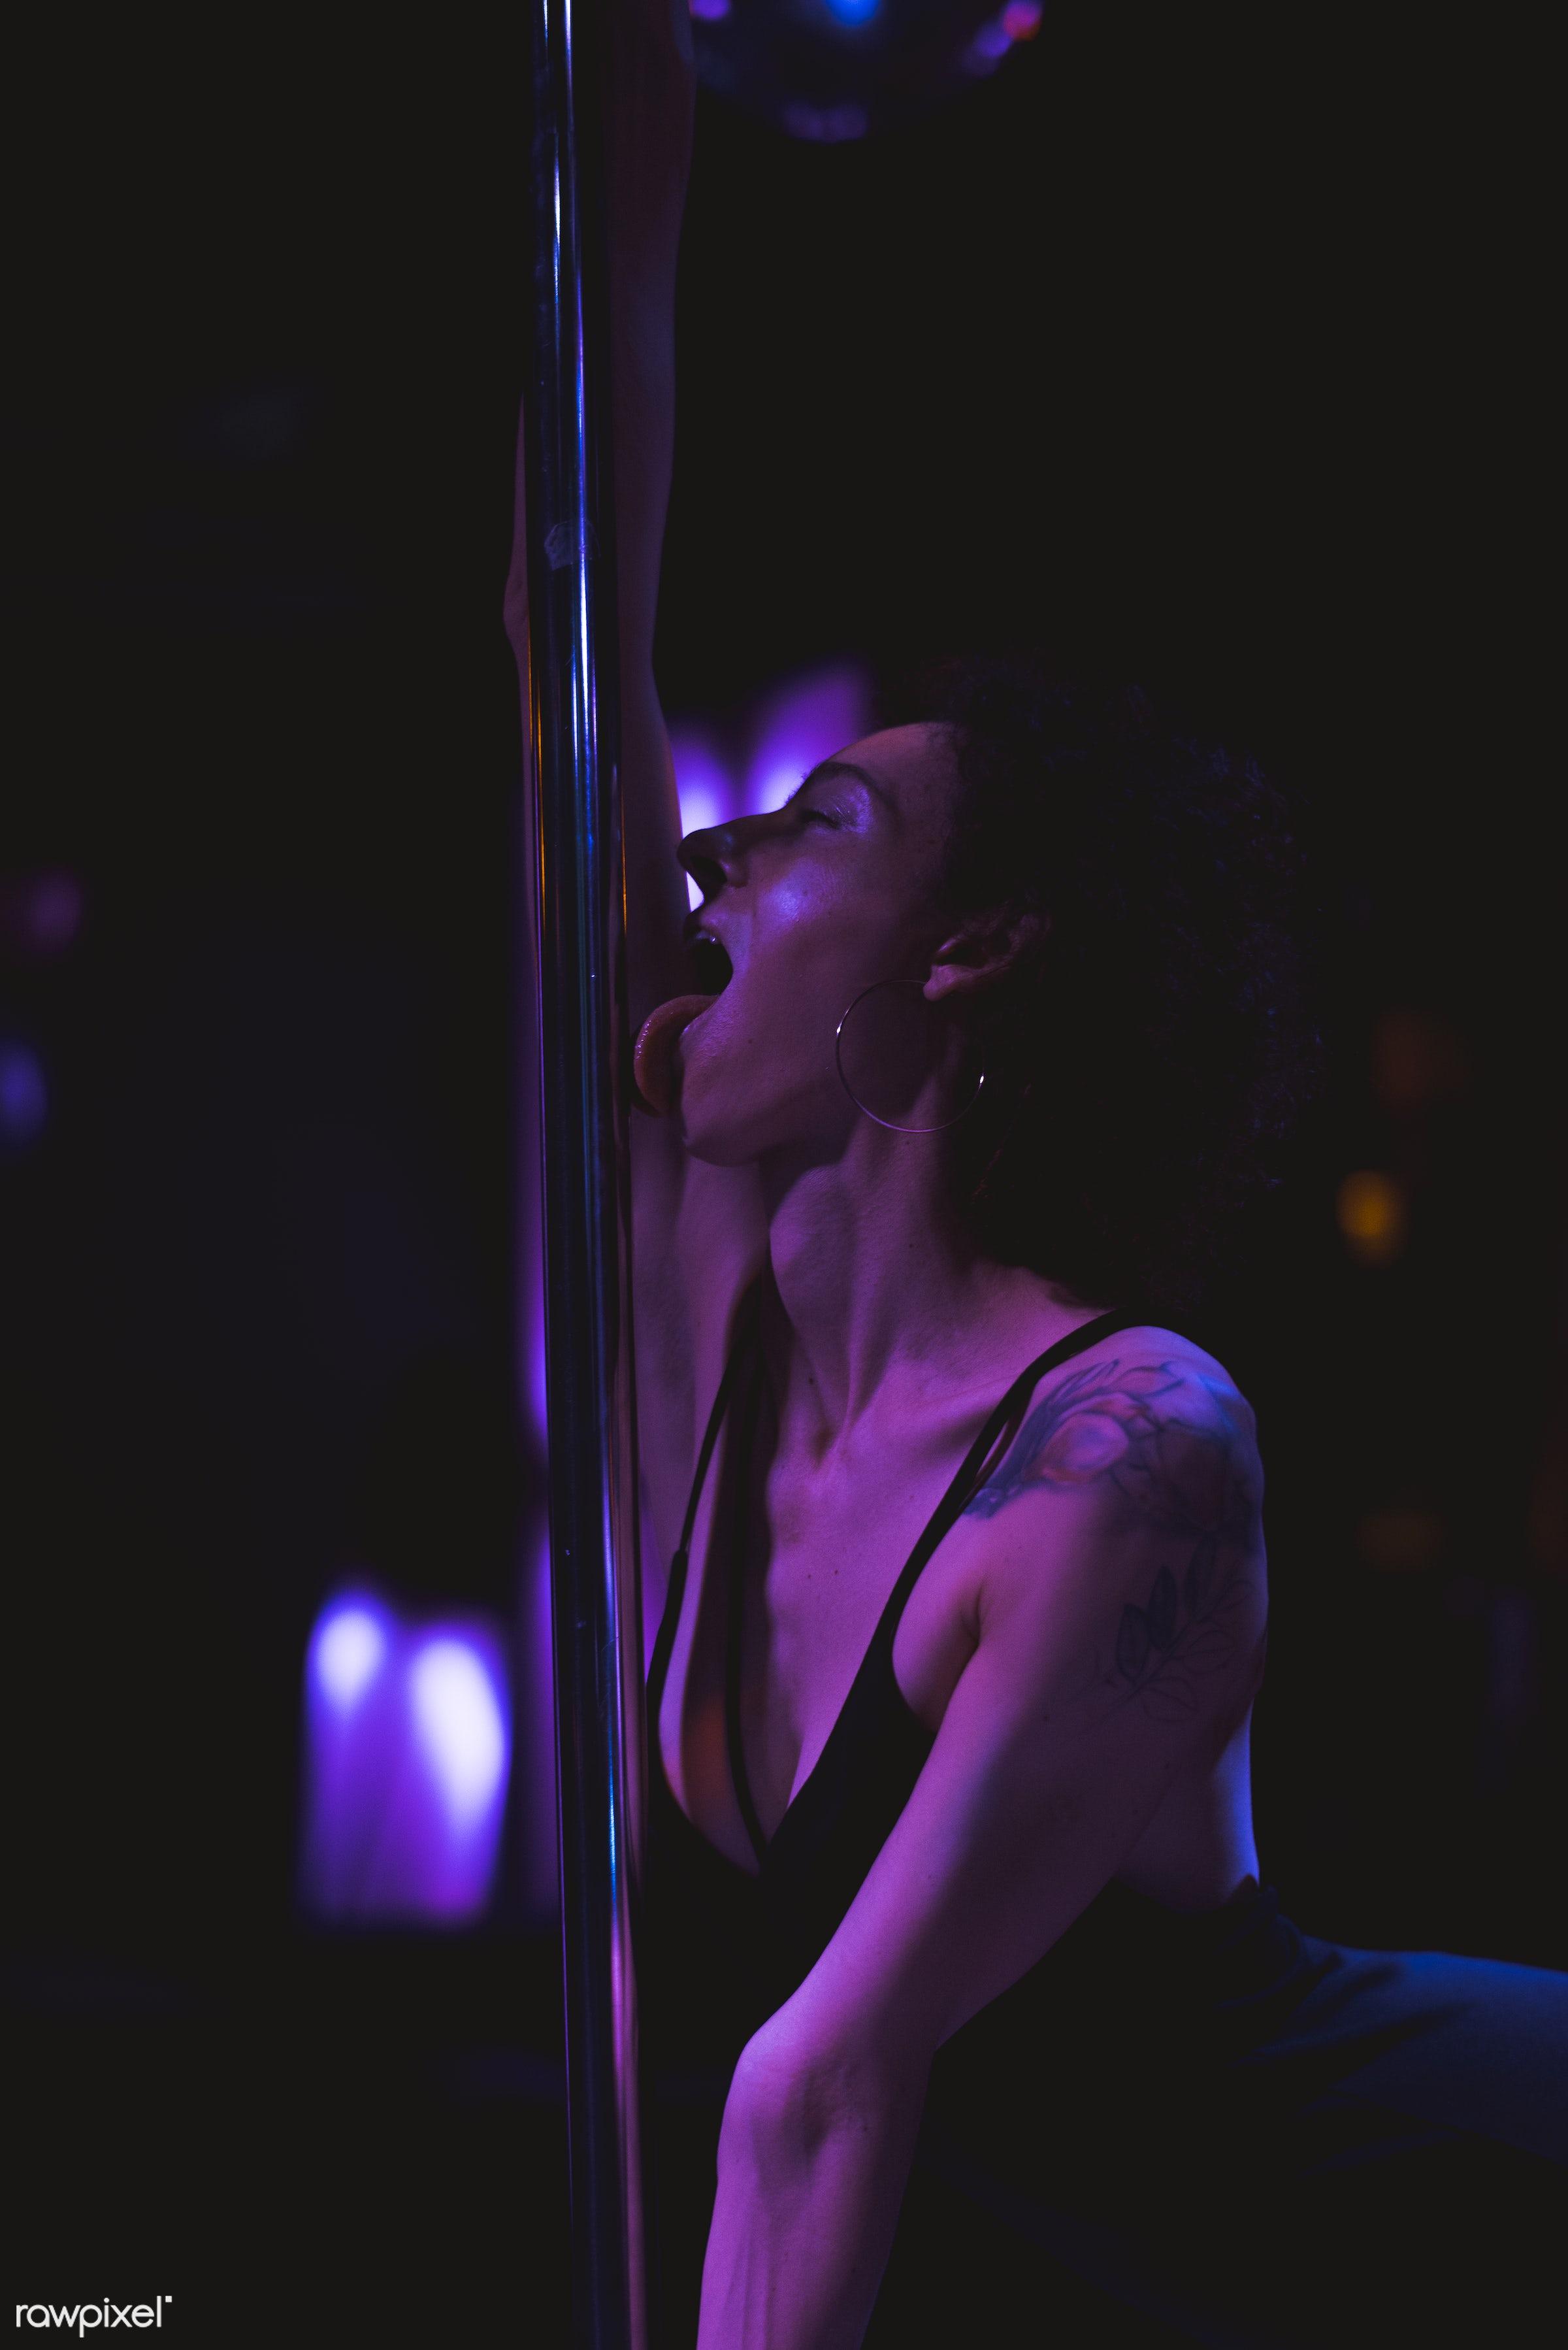 Woman having fun with a stripper pole - alone, bar, cheerful, curly hair, dark, enjoy, fun, lifestyle, night, night life,...